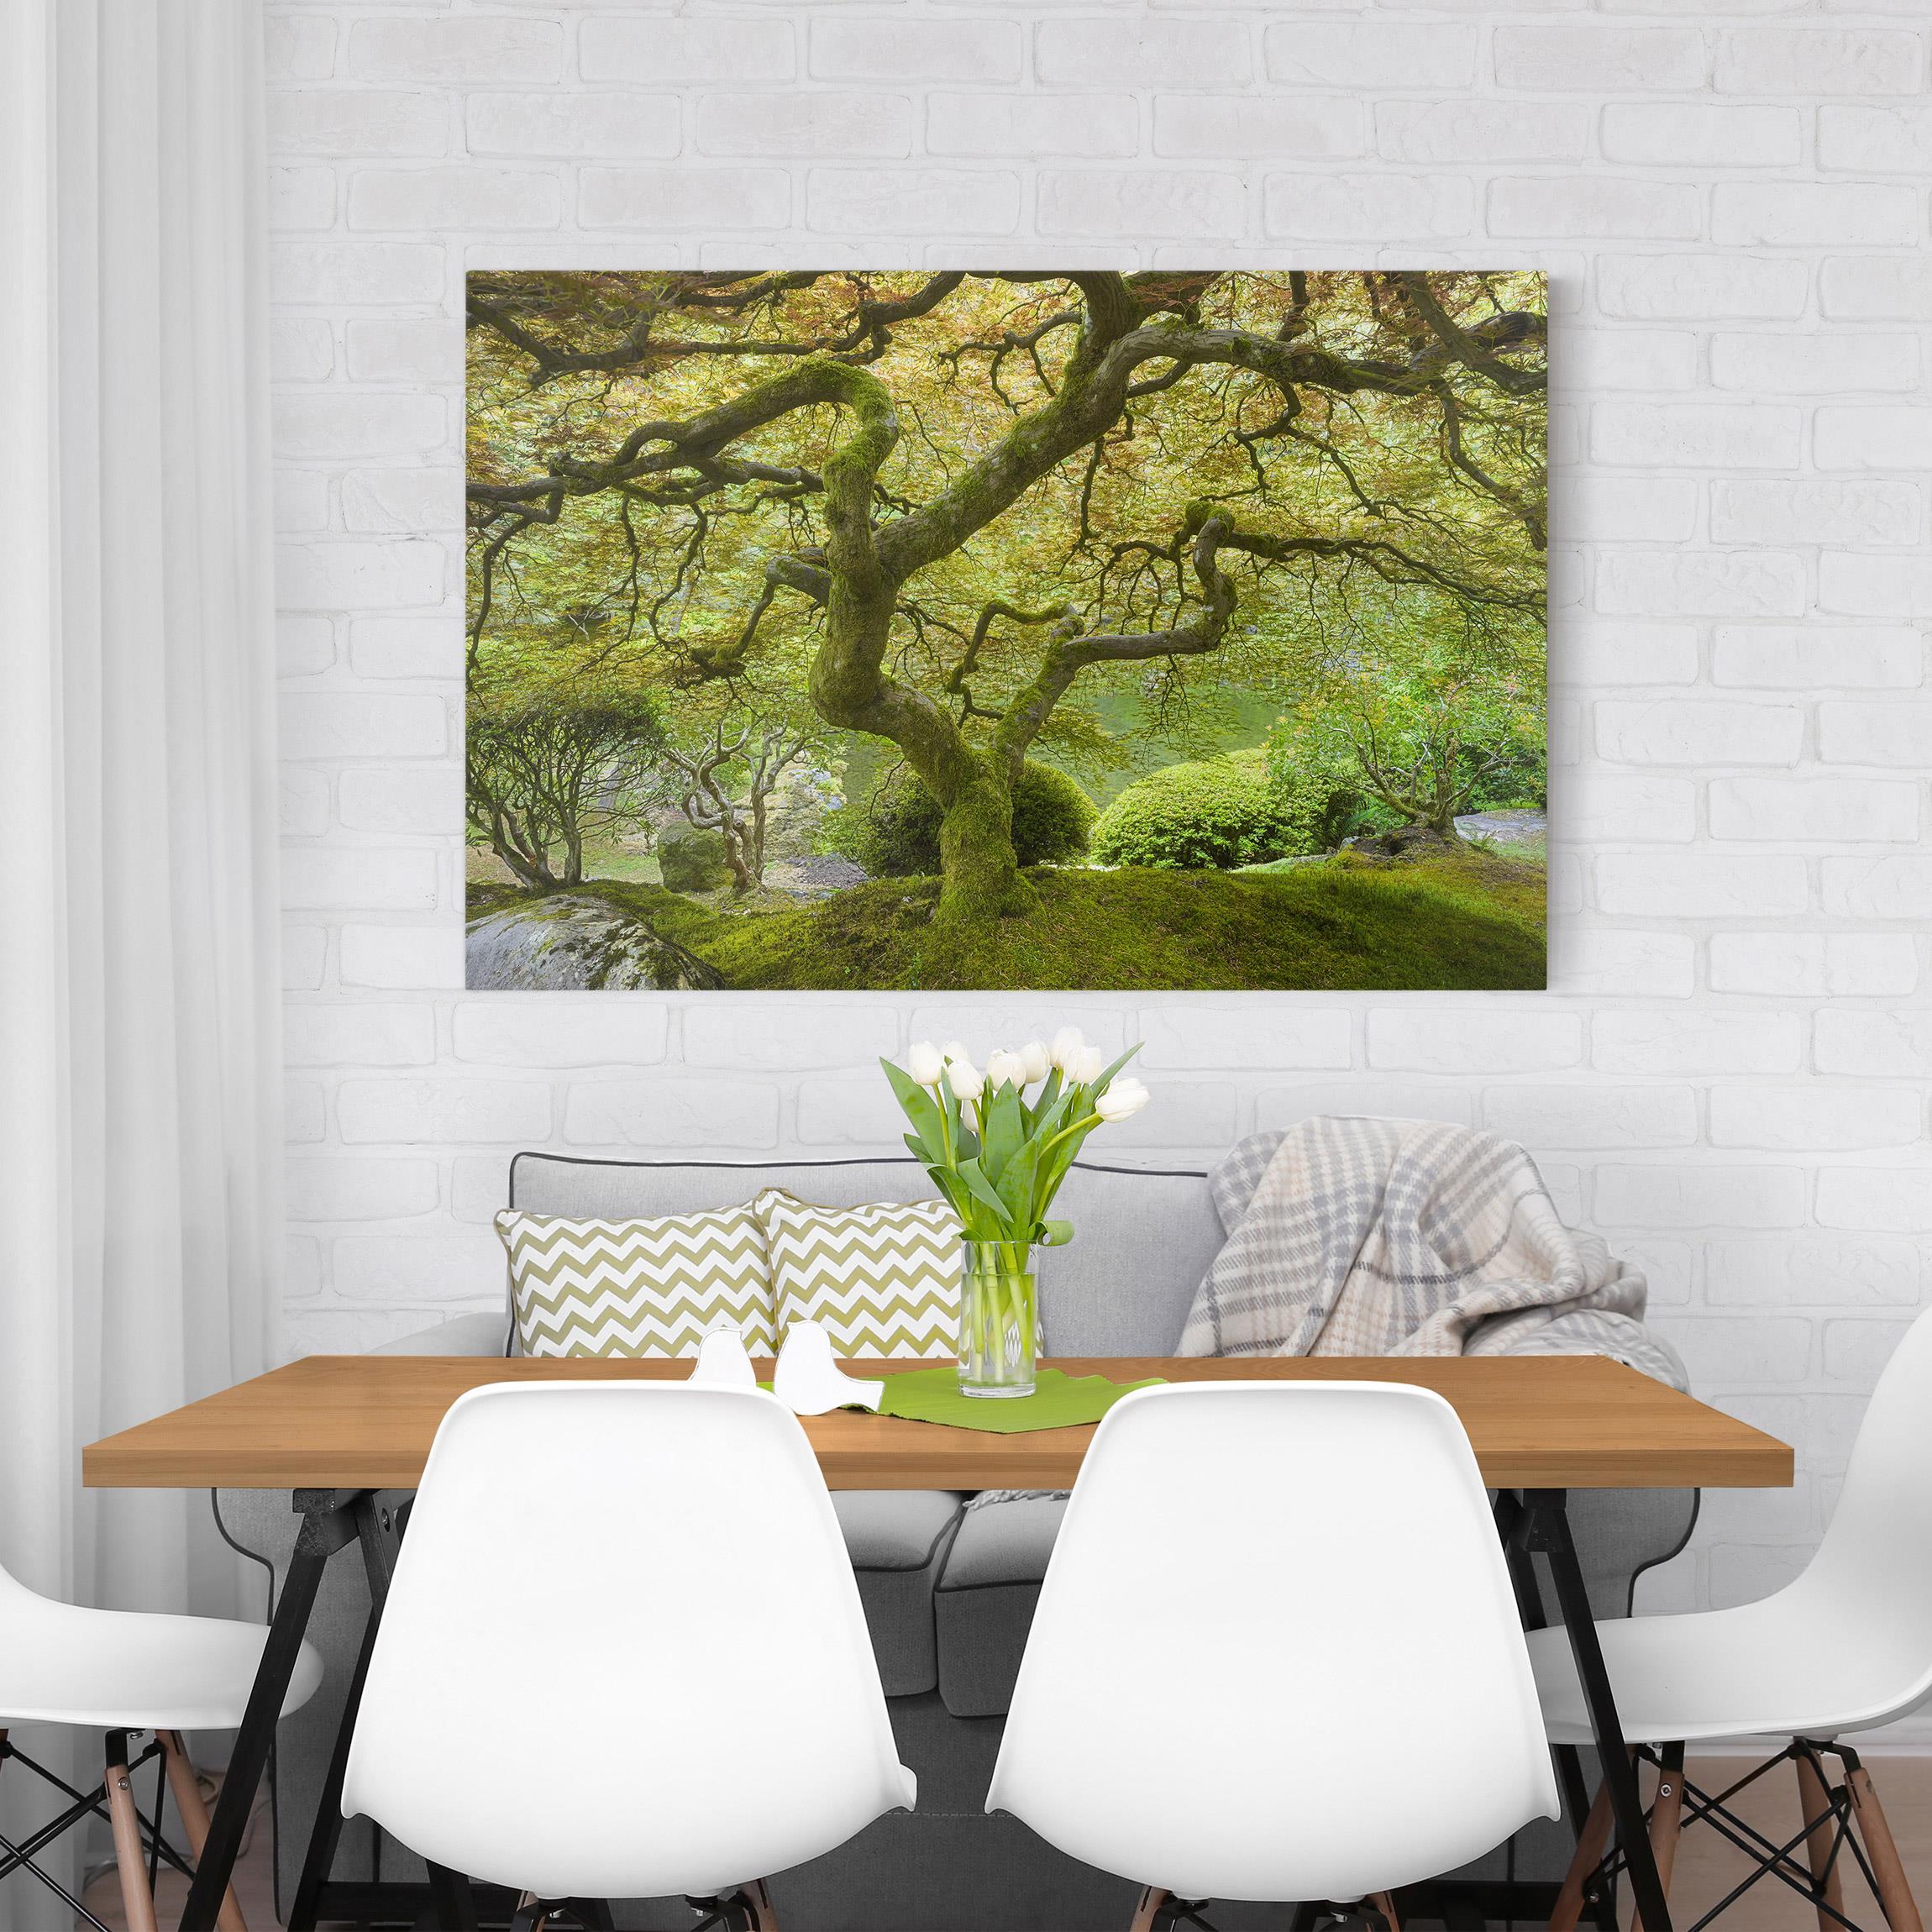 Wandbilder Für Garten: Grüner Japanischer Garten